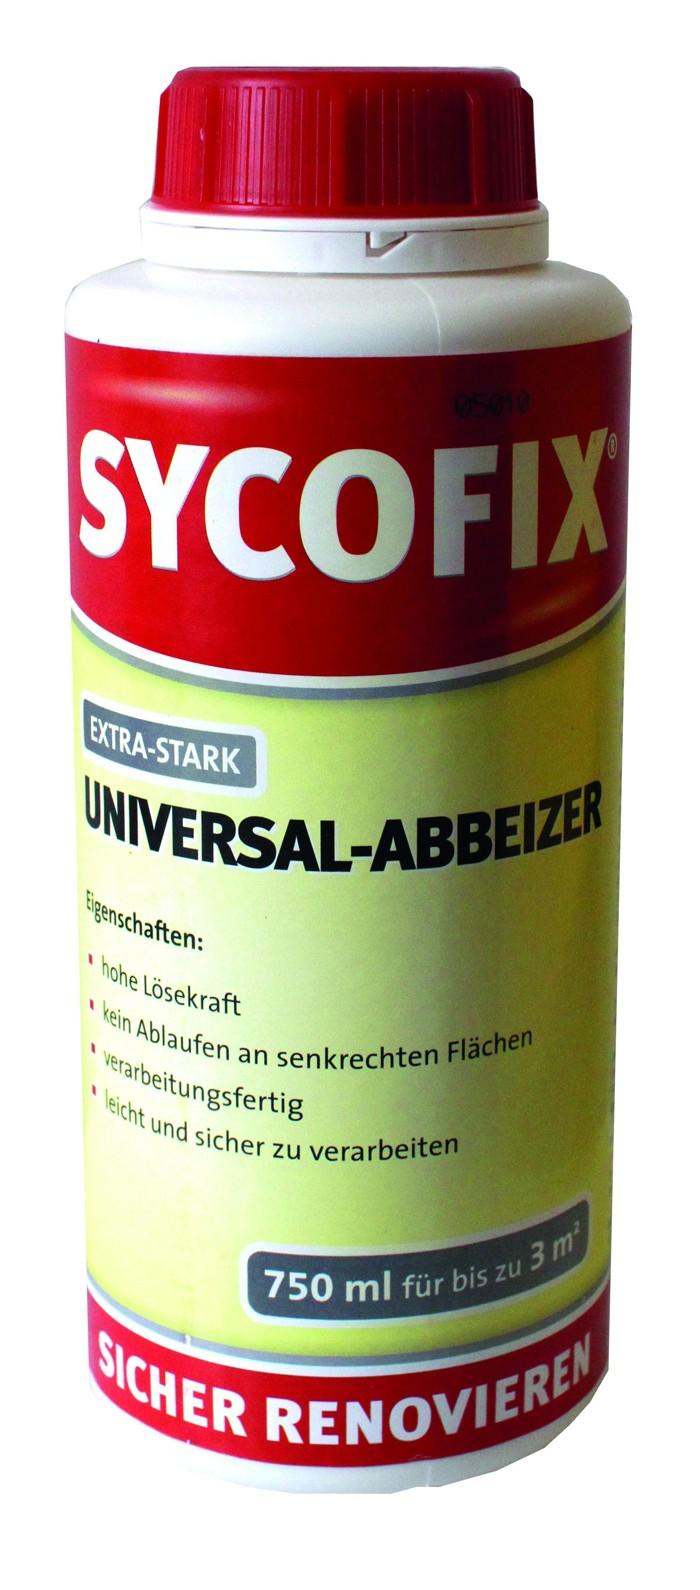 Sycofix - Universal Abbeizer extra - stark 750 ml